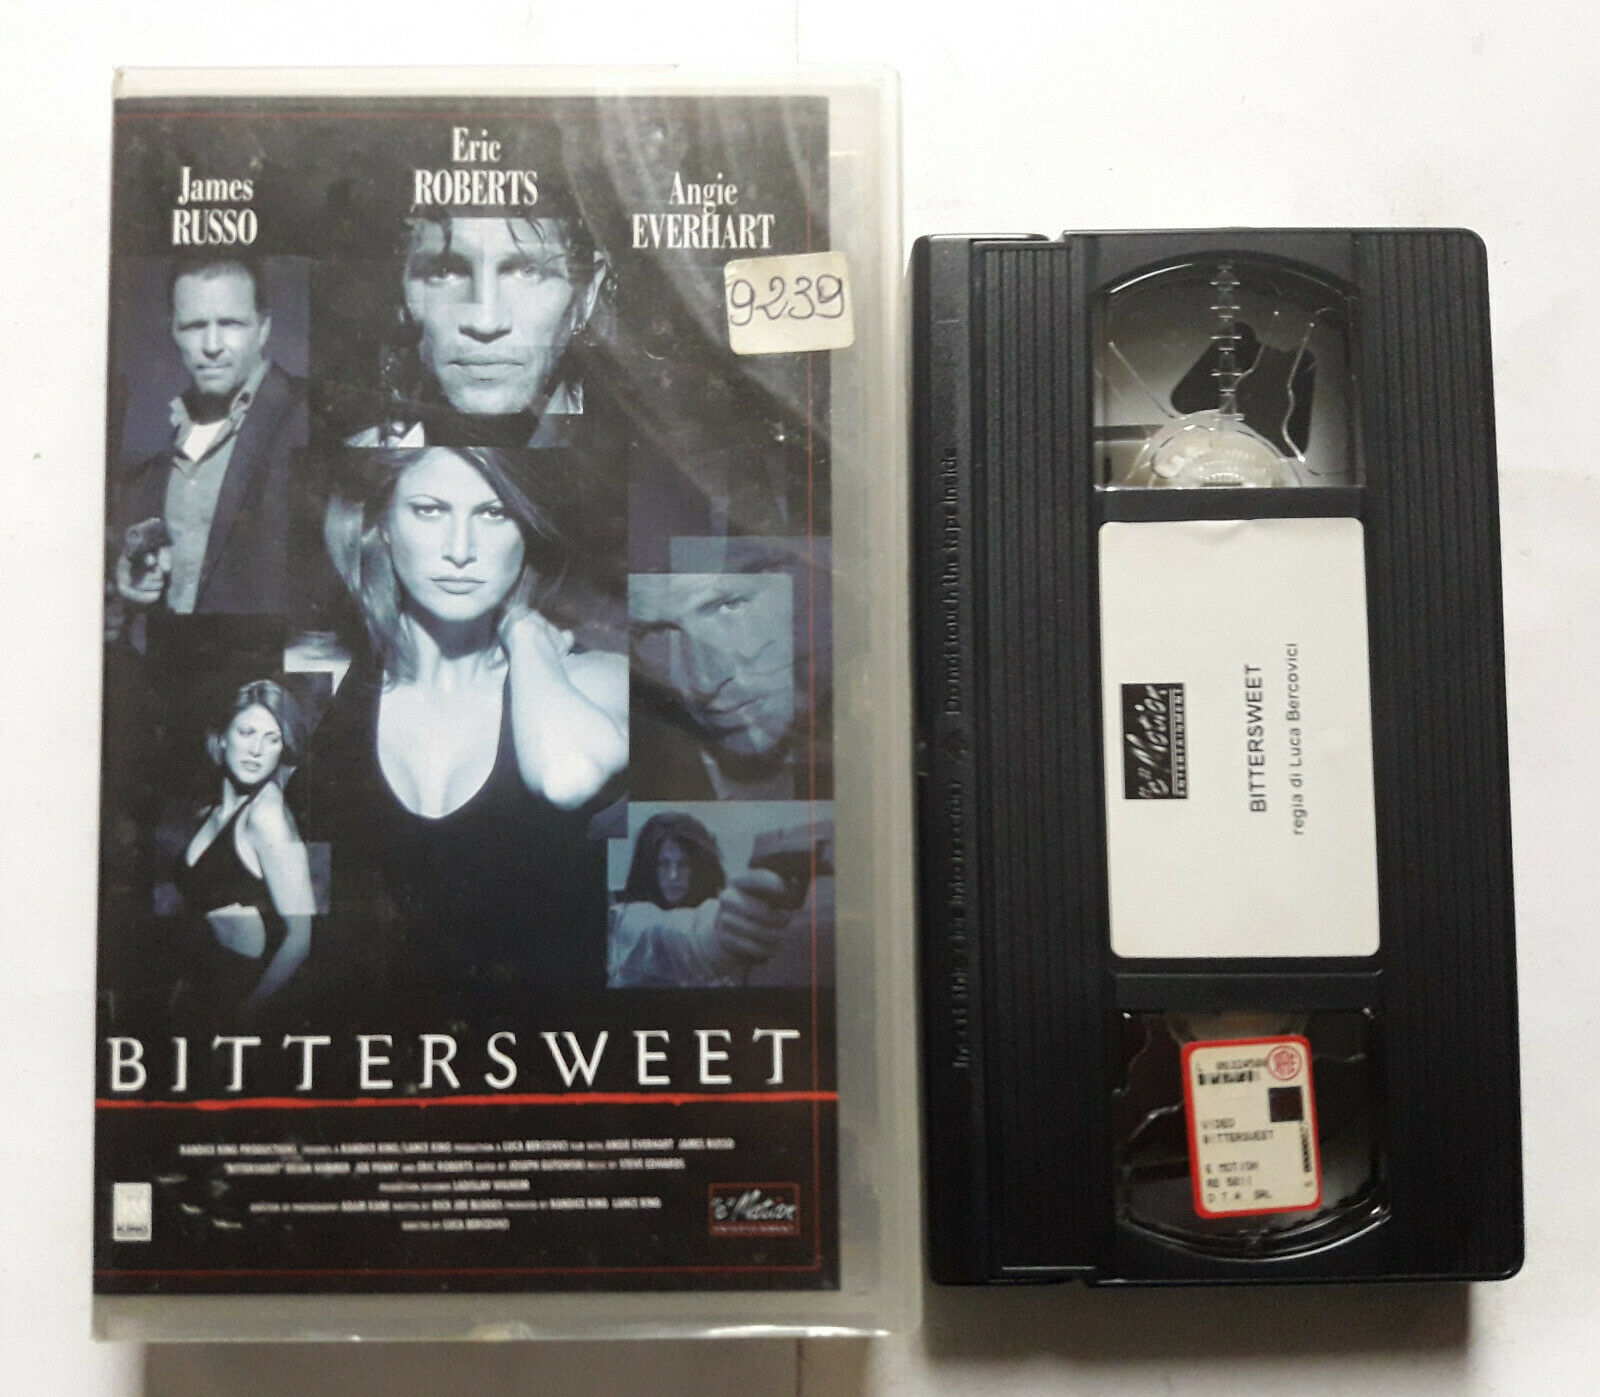 BITTERSWEET / VENDETTE PARALLELE - USATO EX NOLEGGIO (VHS)